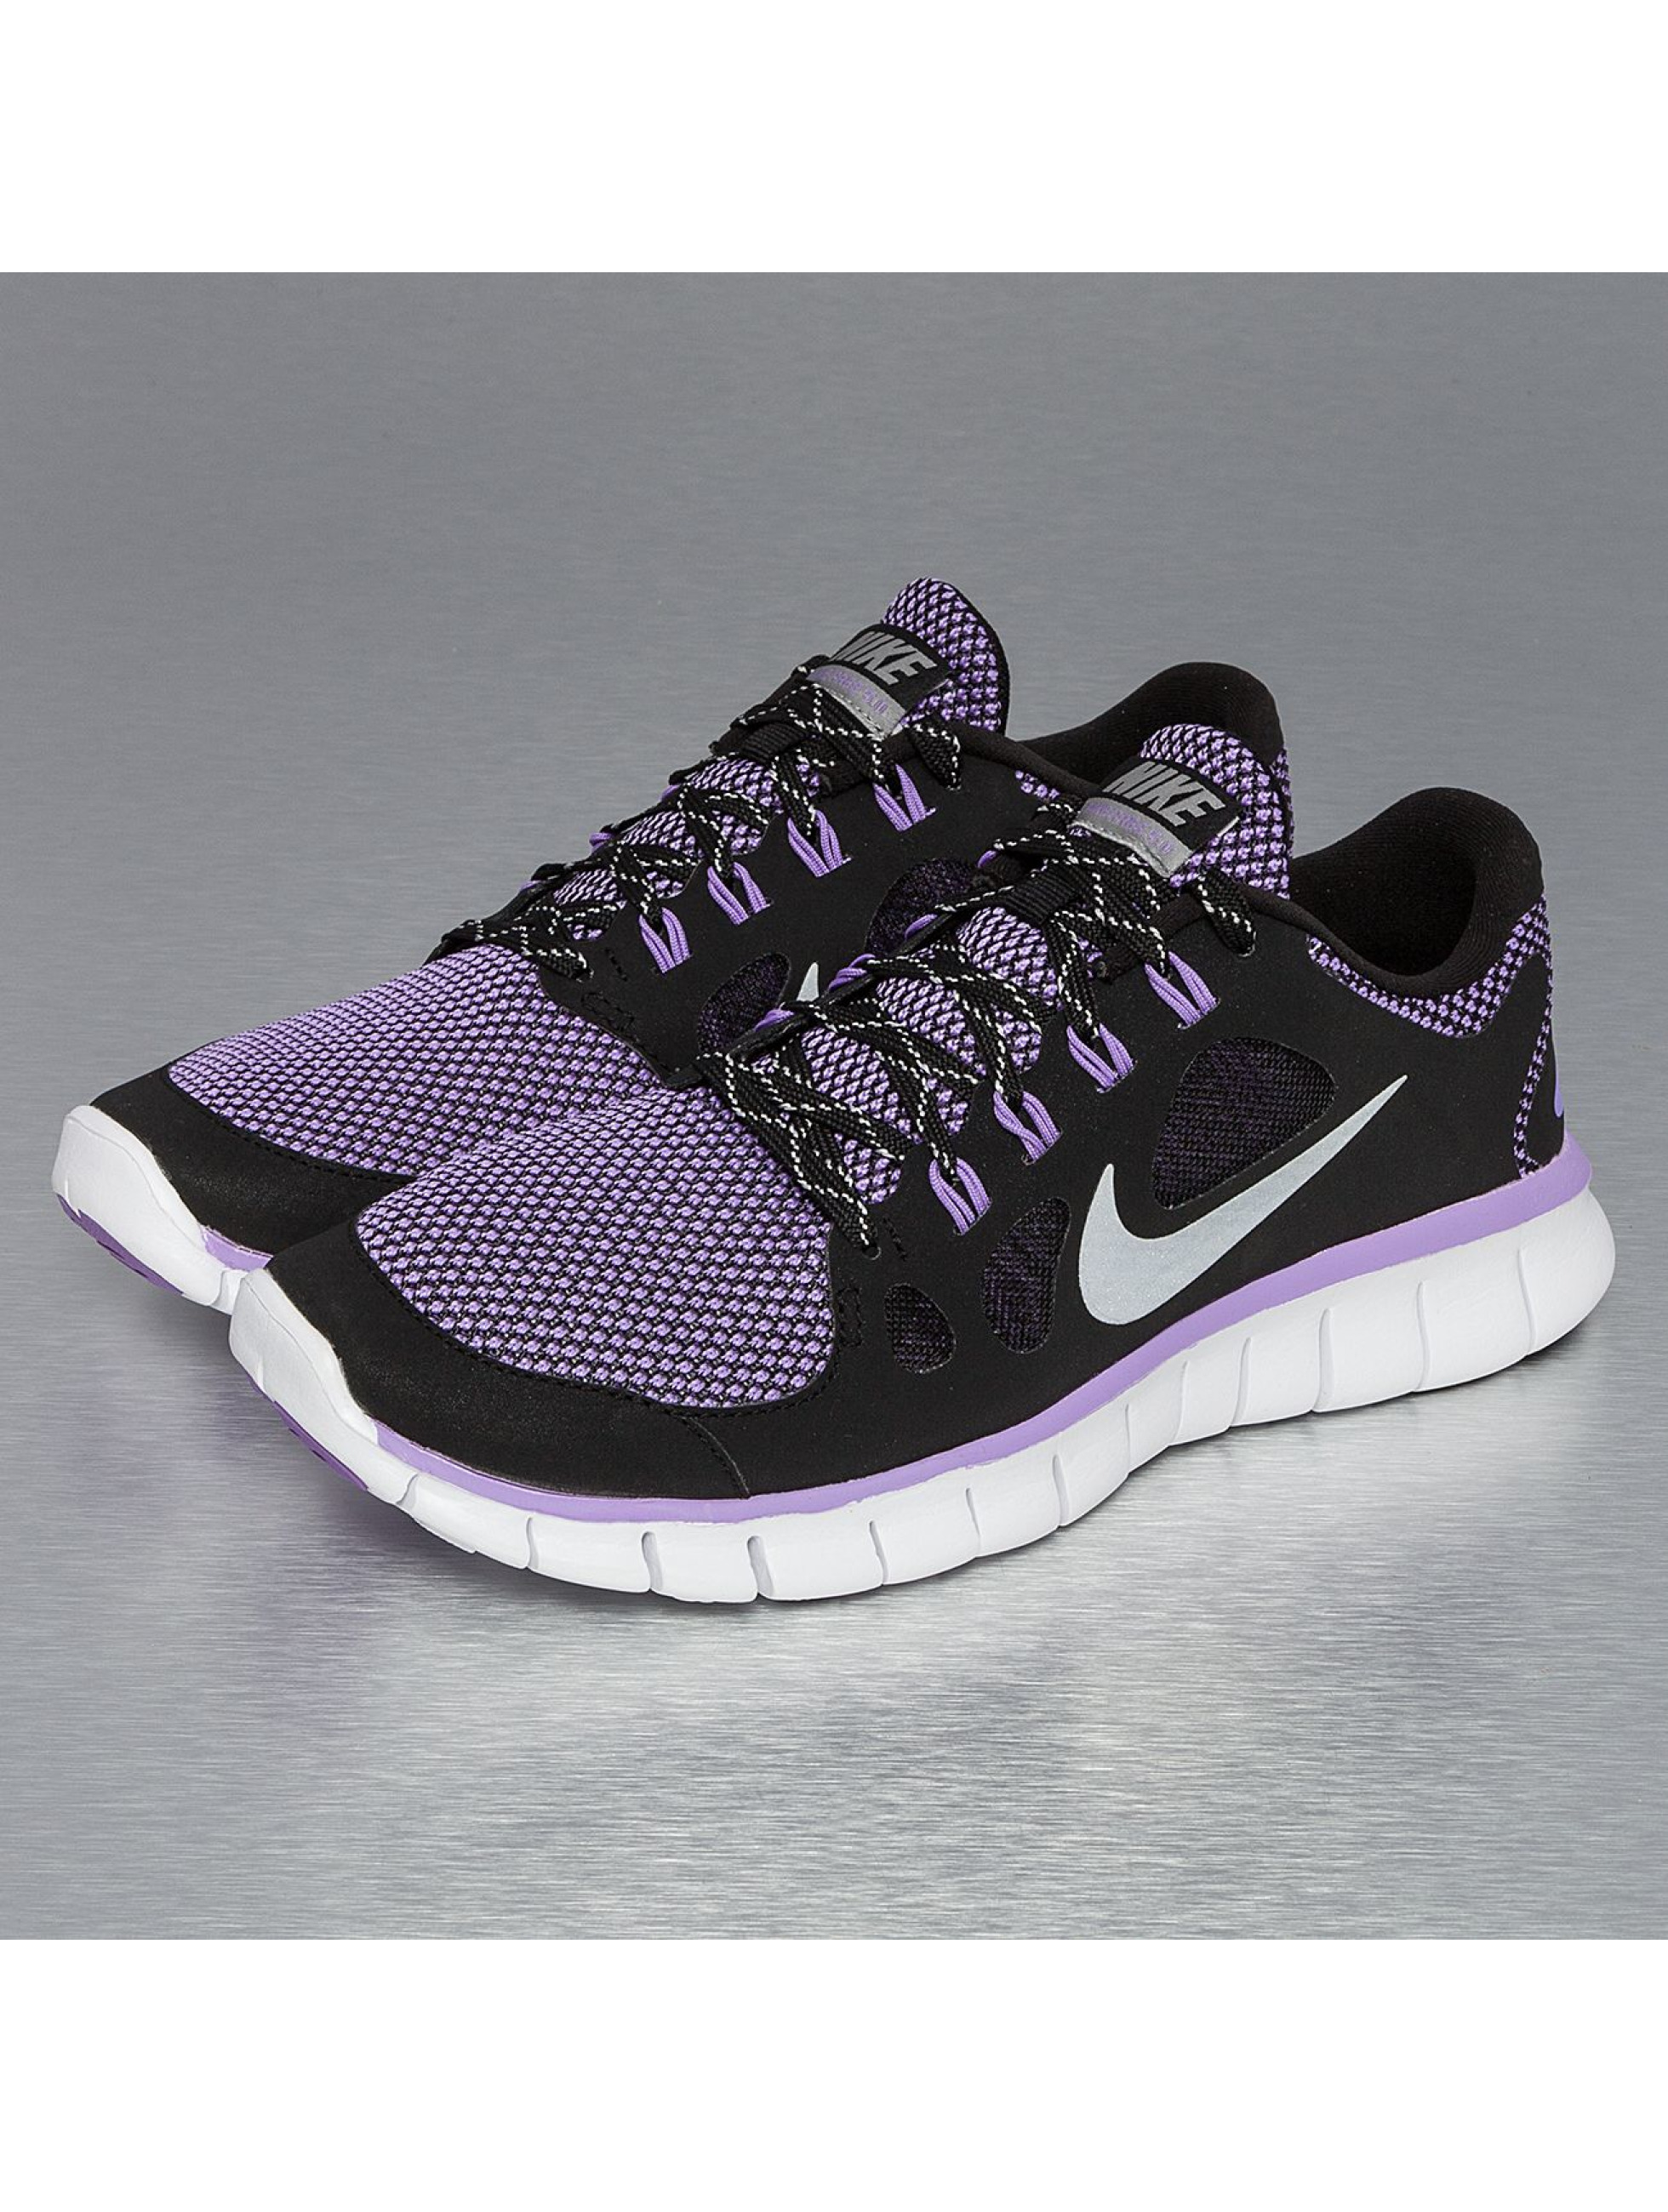 Дисконтцентр спортивной обуви